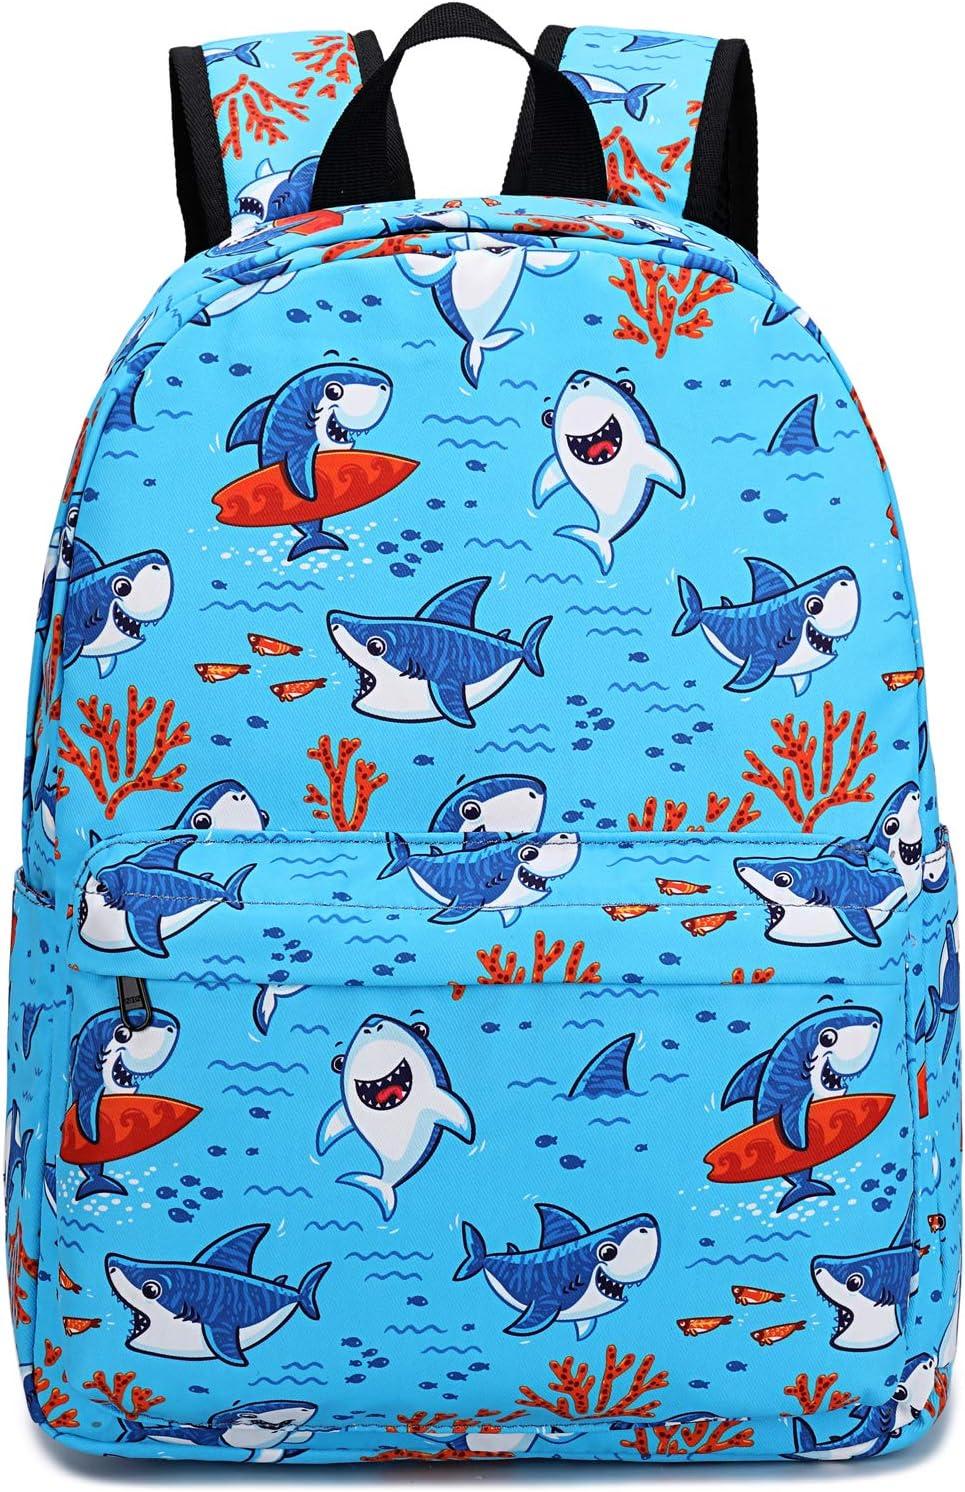 Preschool Backpack for Kids Boys Toddler Backpack Kindergarten School Bookbags (Cute Shark-Blue)